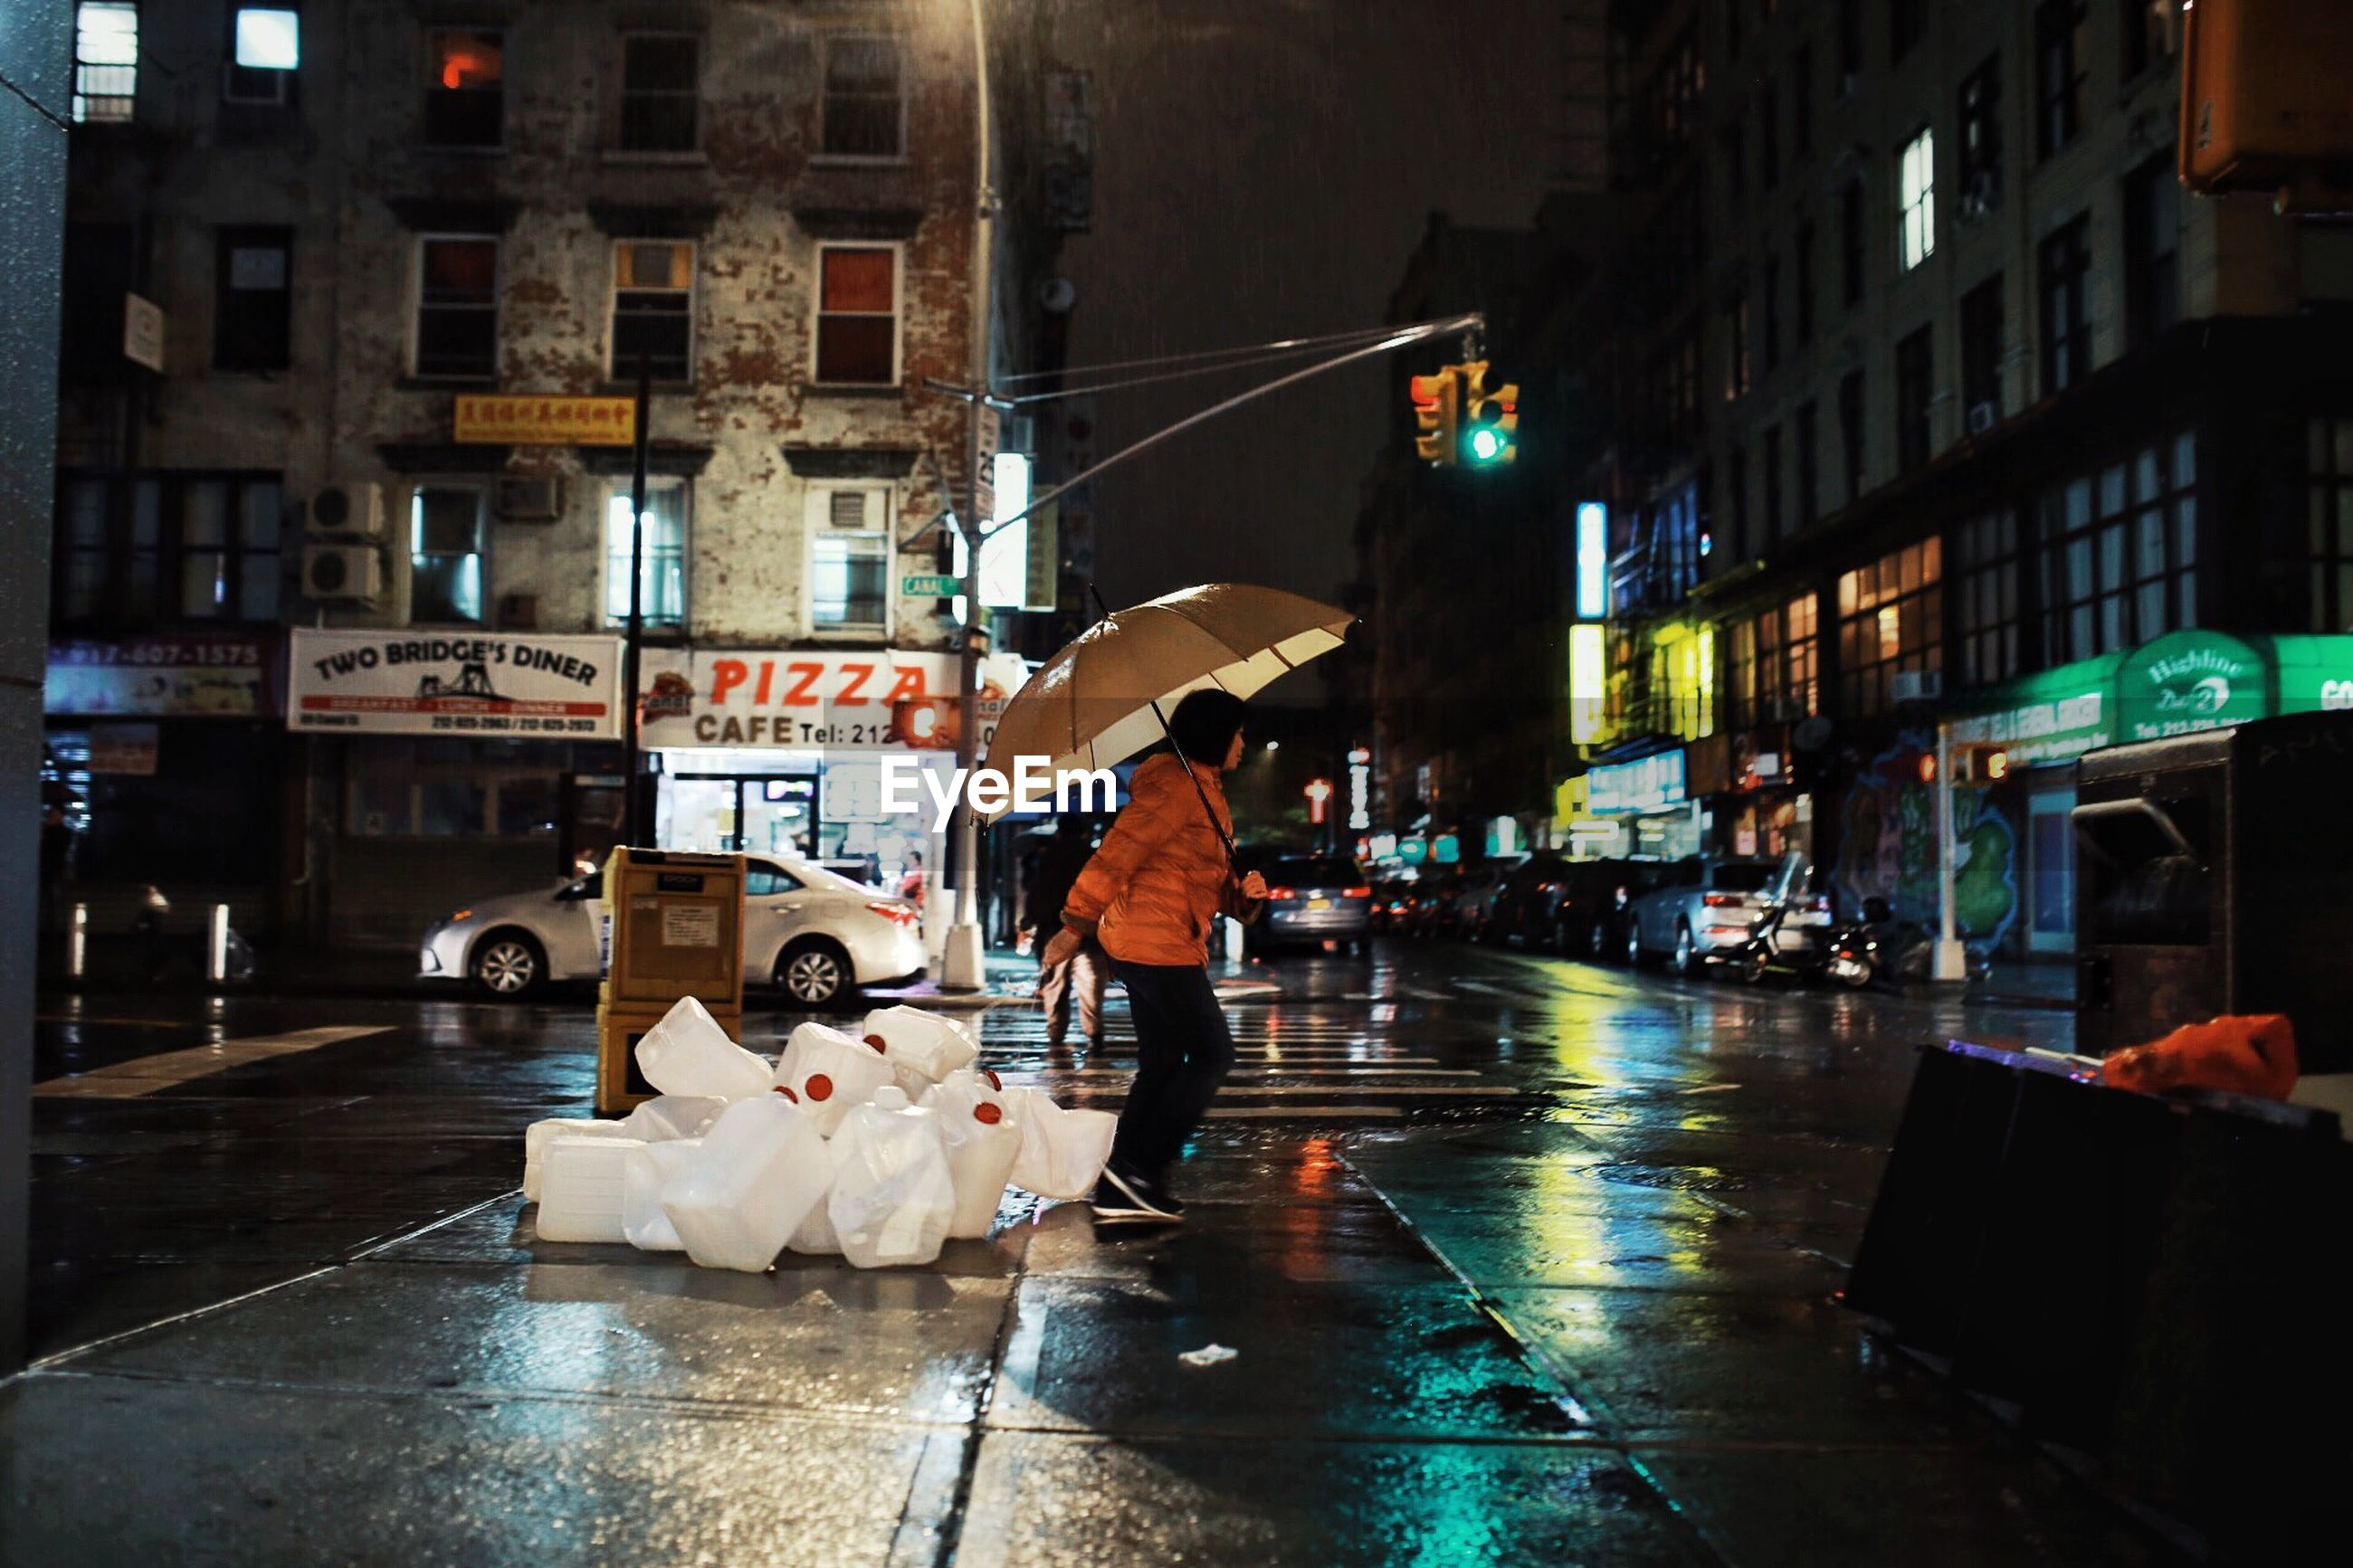 city, building exterior, street, architecture, wet, umbrella, rain, built structure, real people, city life, protection, walking, men, transportation, people, city street, illuminated, motor vehicle, lifestyles, rainy season